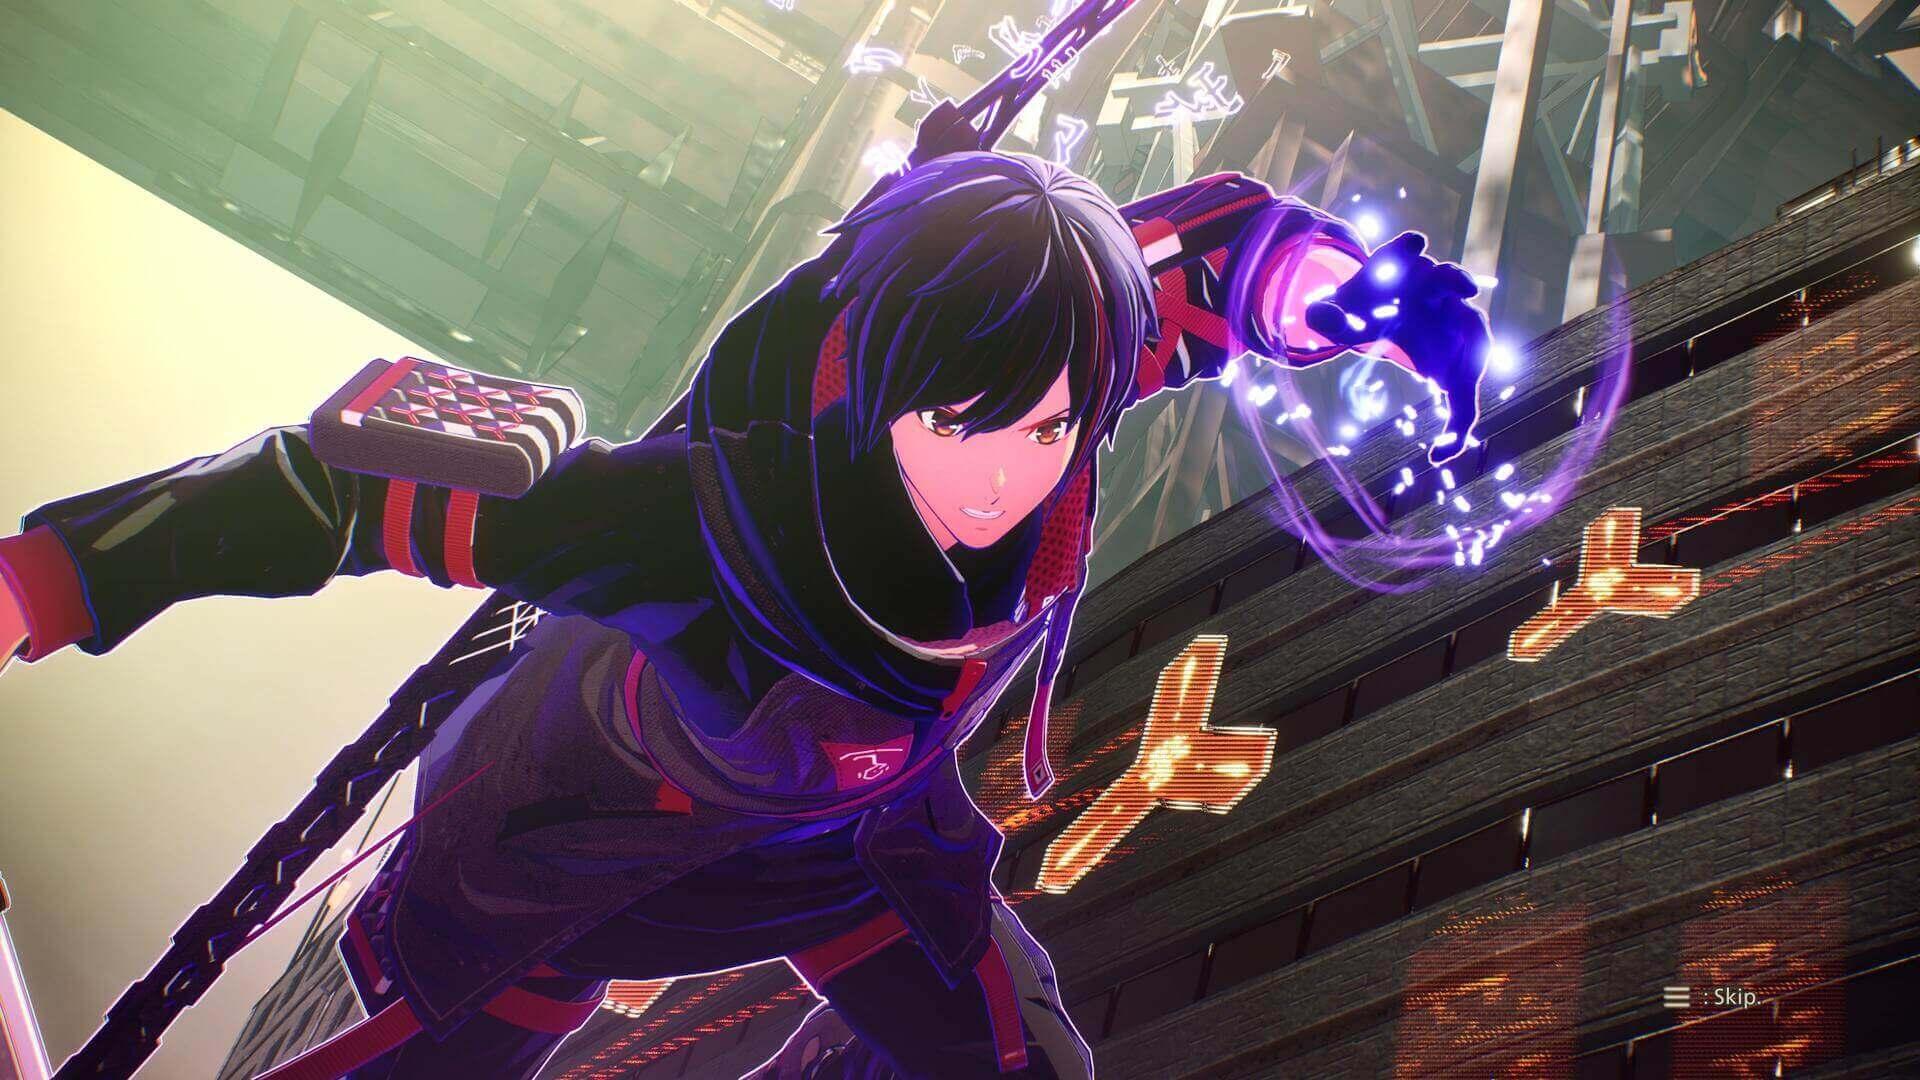 Análise Scarlett Nexus, Scarlett Nexus, Bandai Namco, Delfos